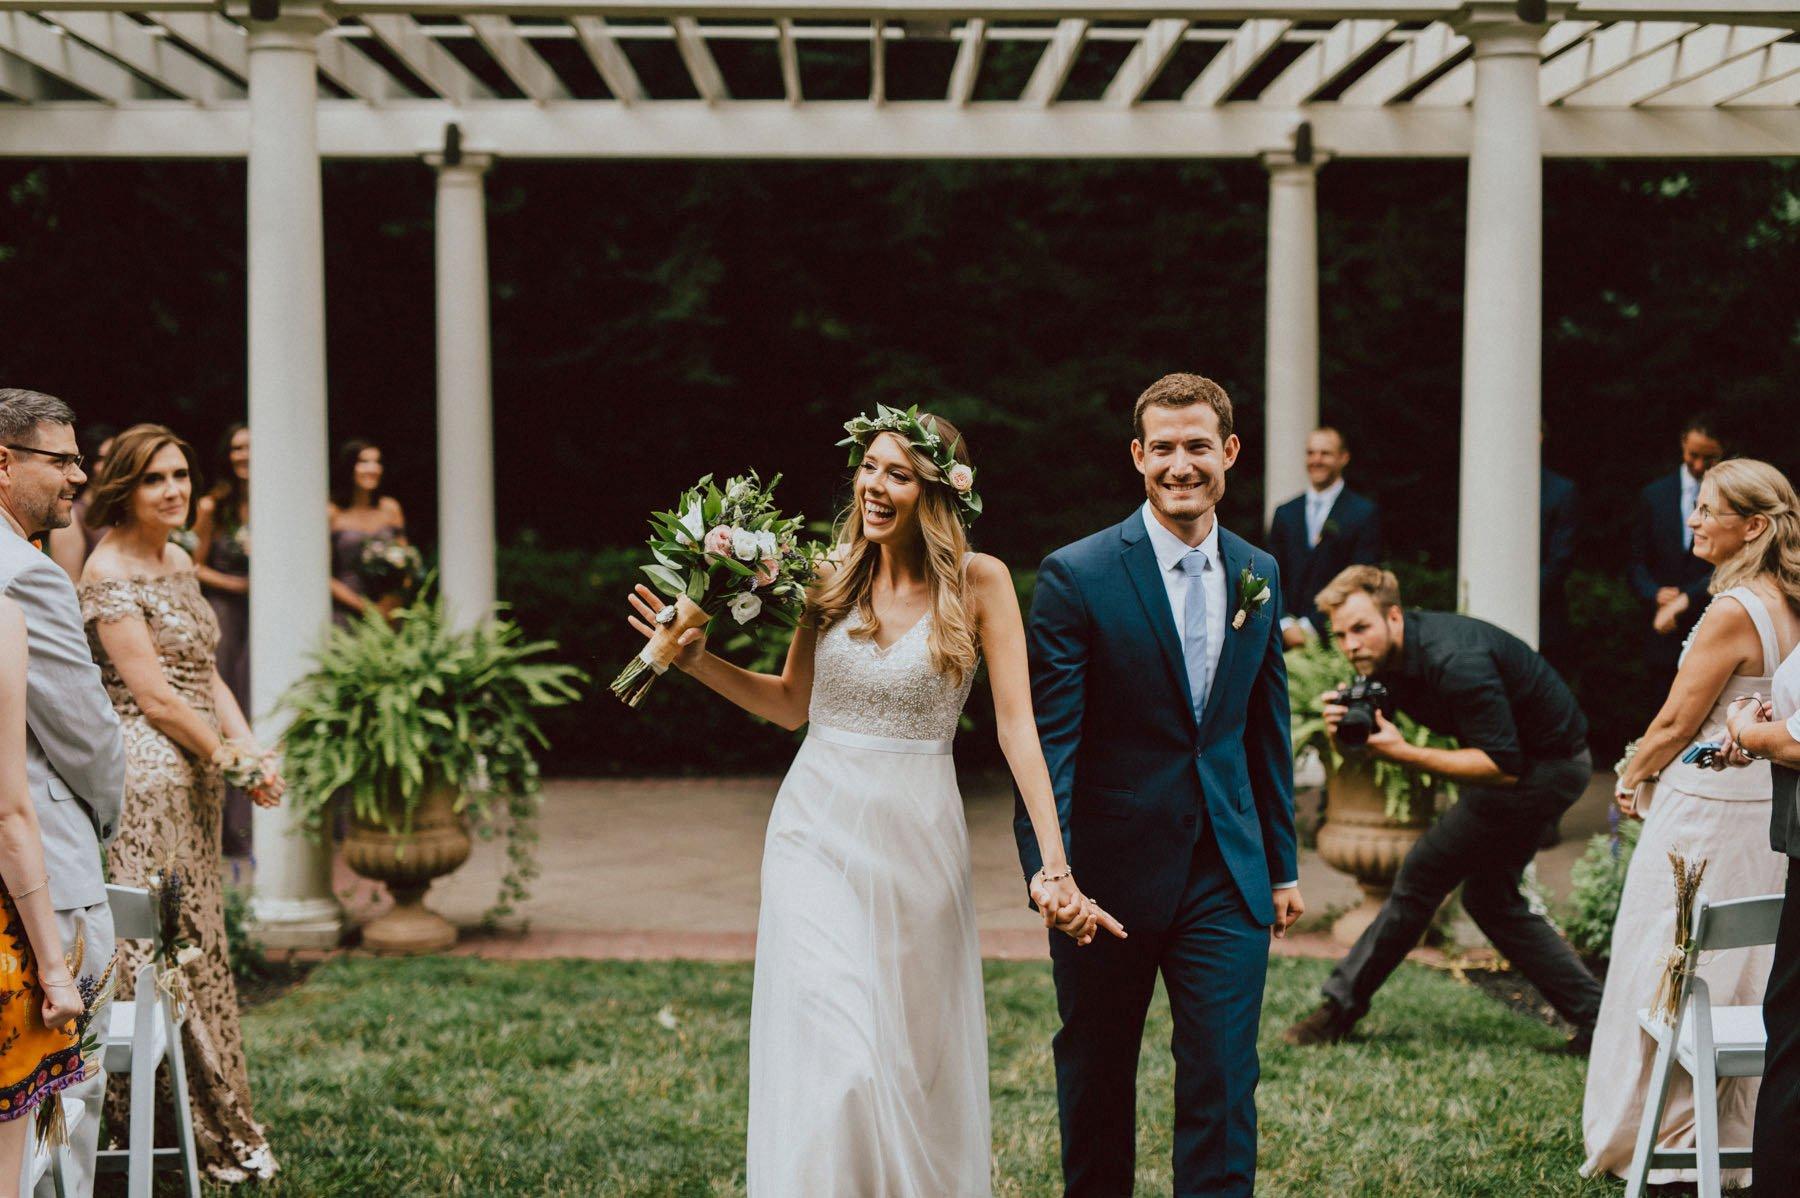 Knowlton-mansion-wedding-104.jpg